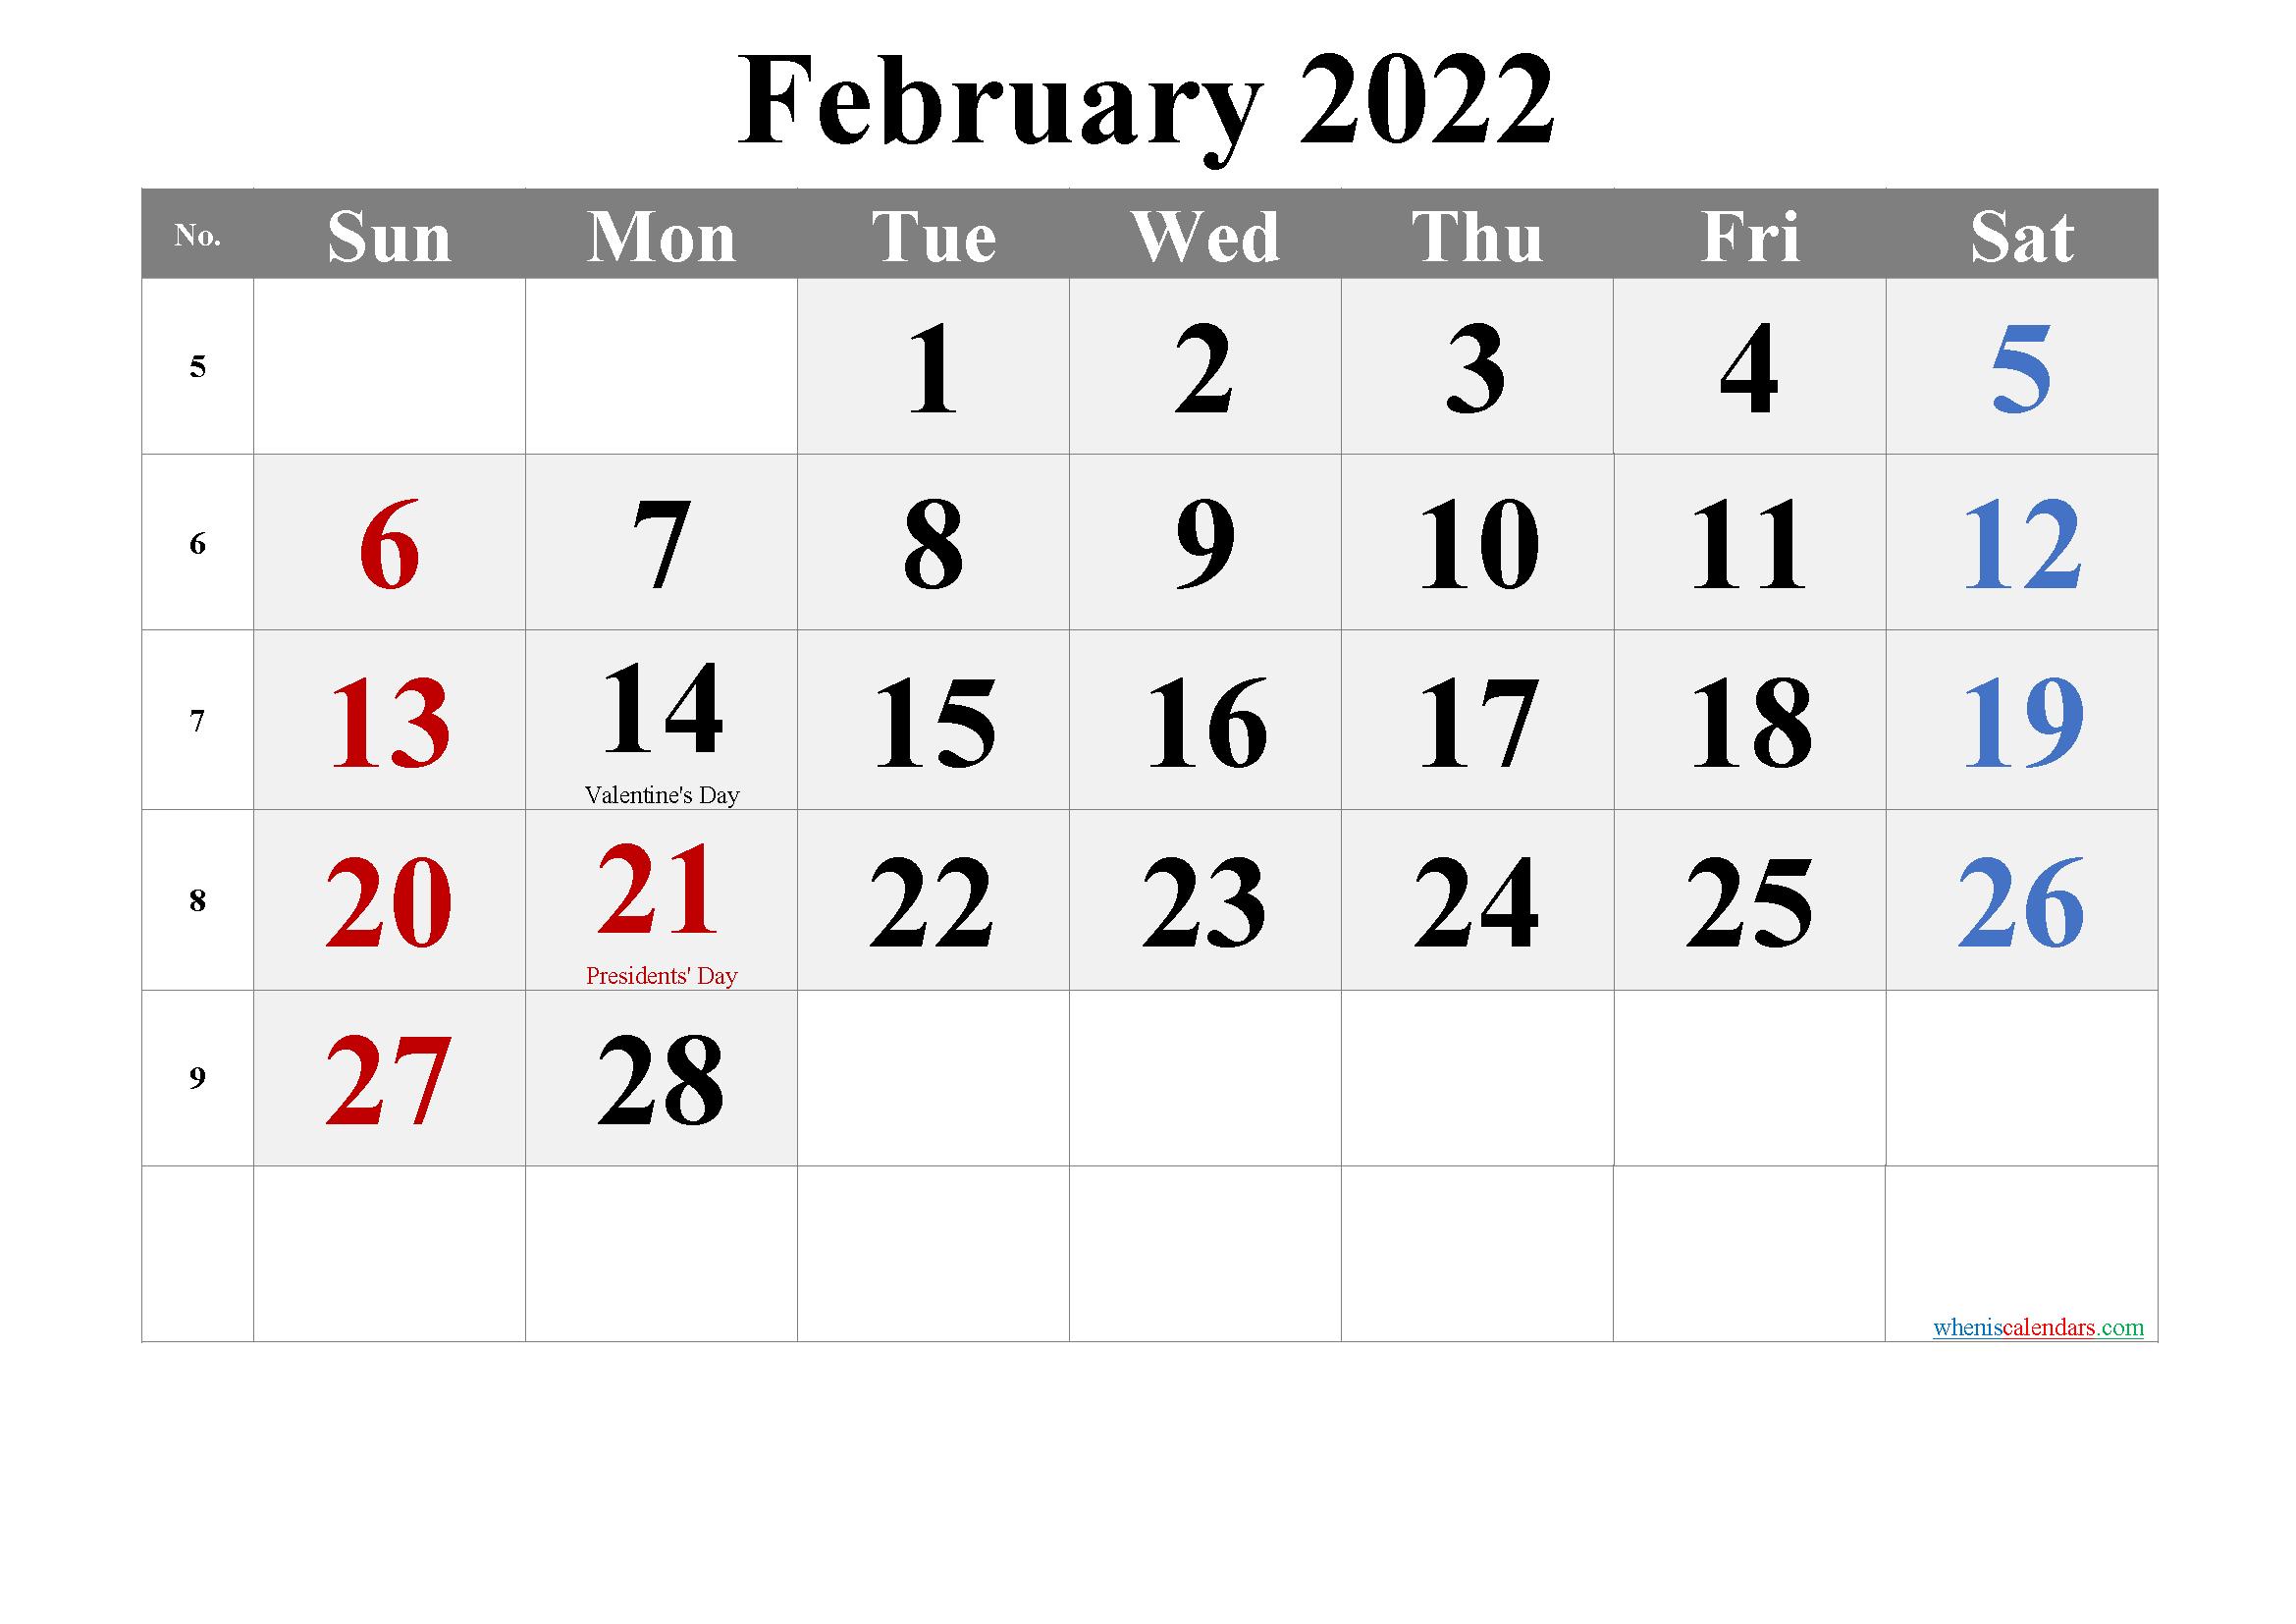 FEBRUARY 2022 Printable Calendar with Holidays